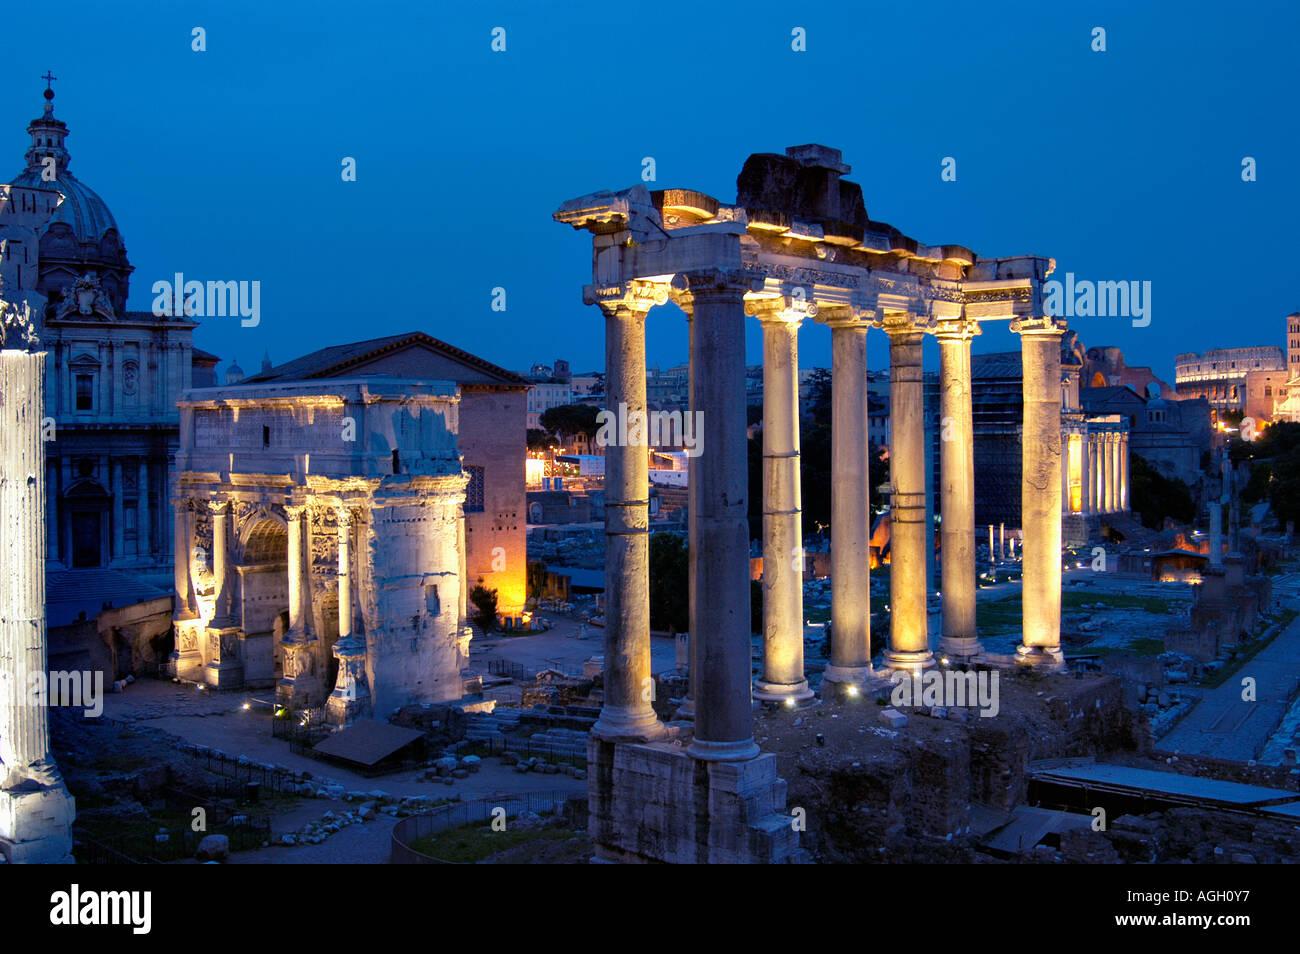 Ruinen in der Abenddämmerung, Roman Forum, Foro Romano, Rom, Italien Stockbild